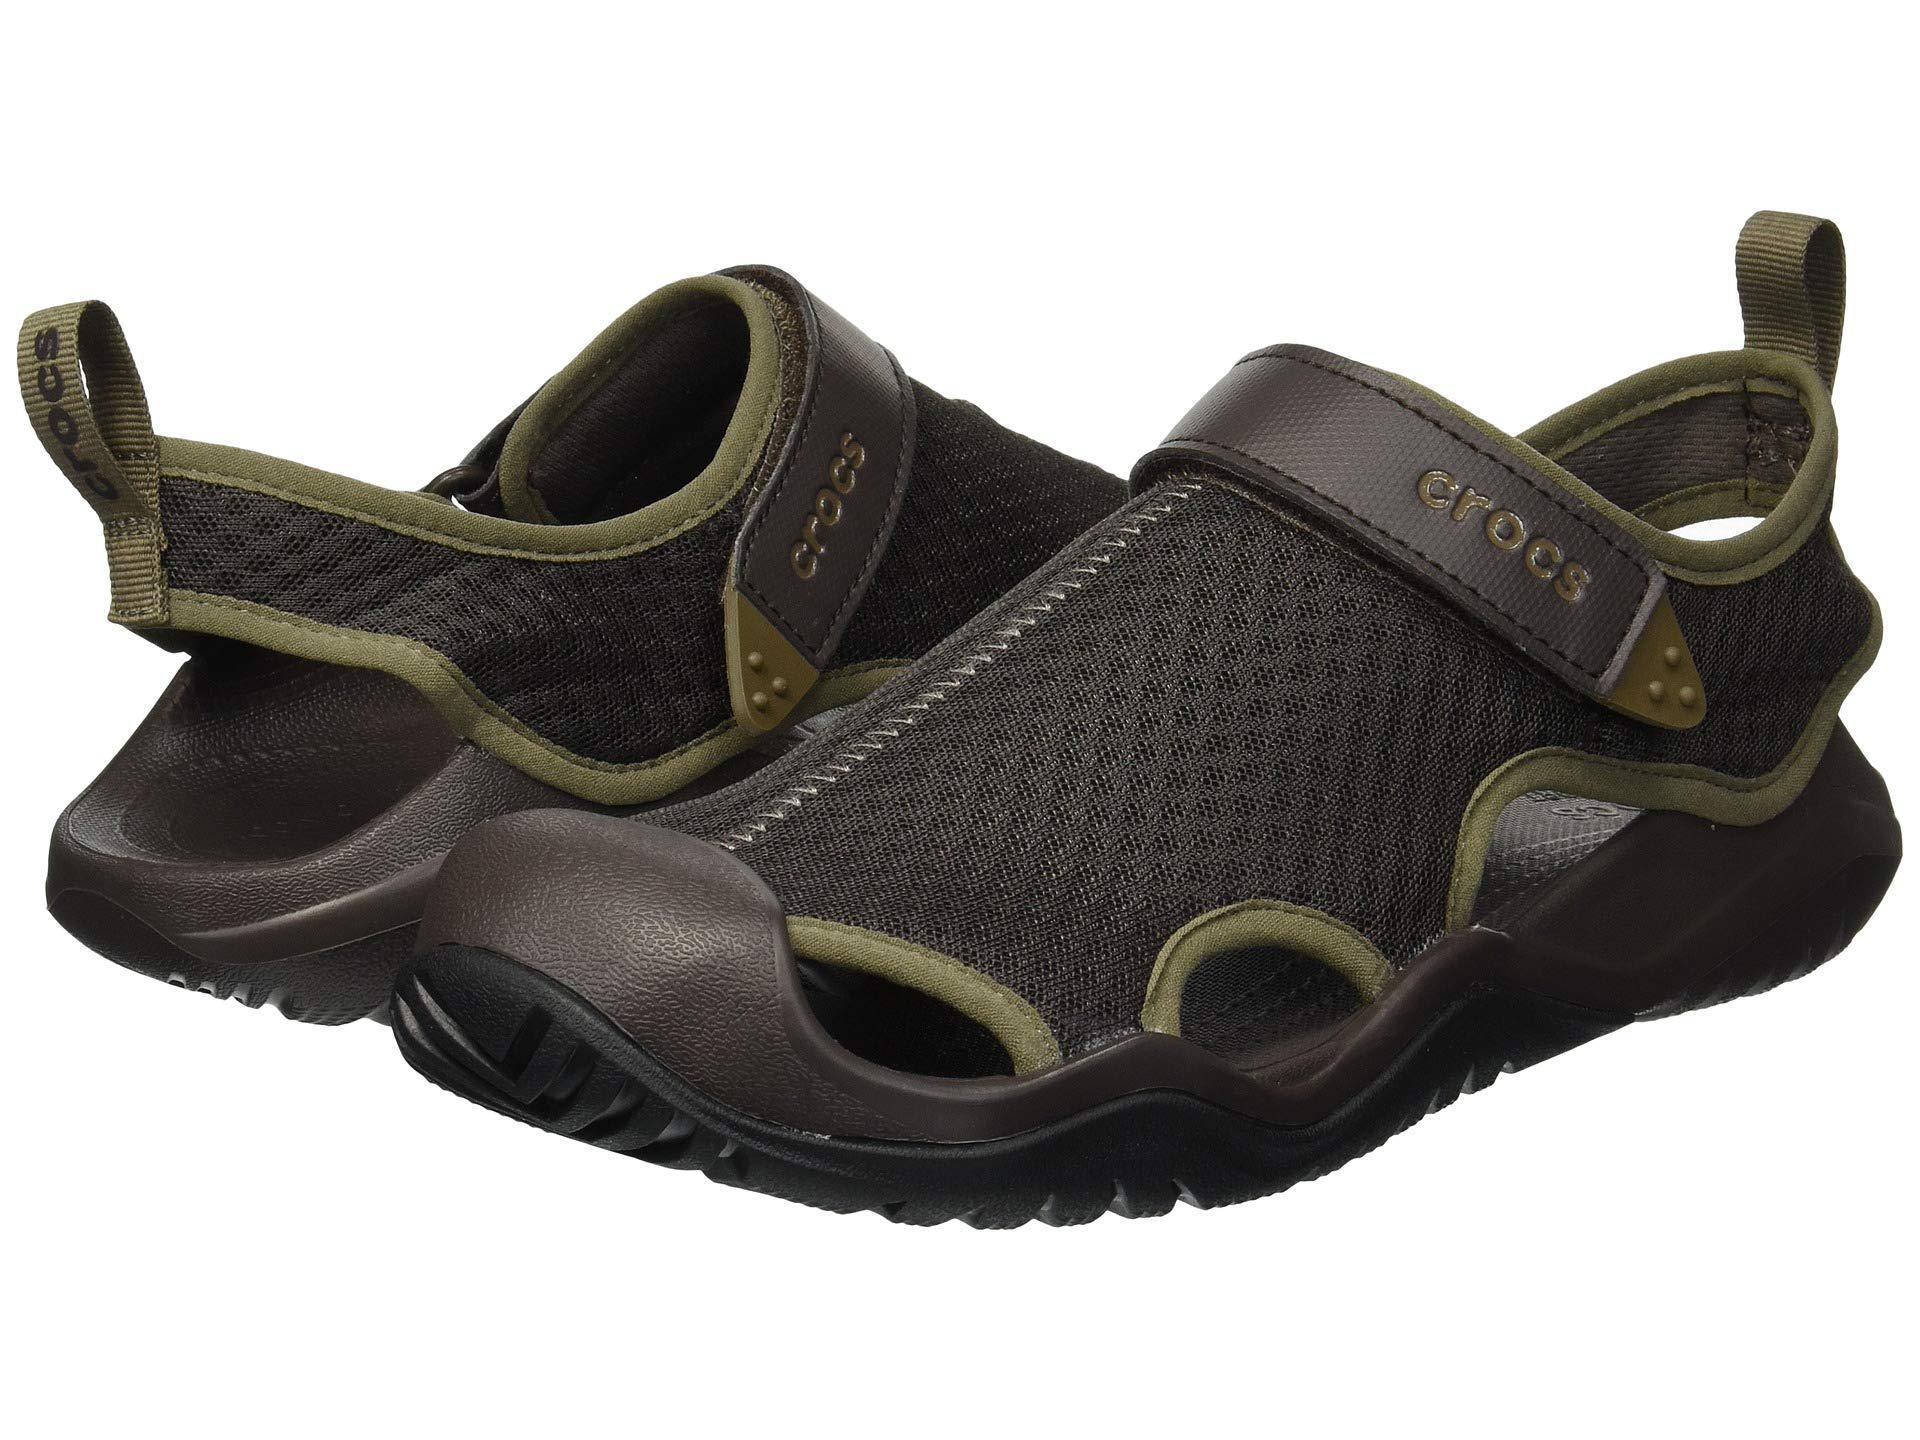 681f2bc46a19 Lyst - Crocs™ Swiftwater Mesh Deck Sandal (black) Men s Sandals in ...